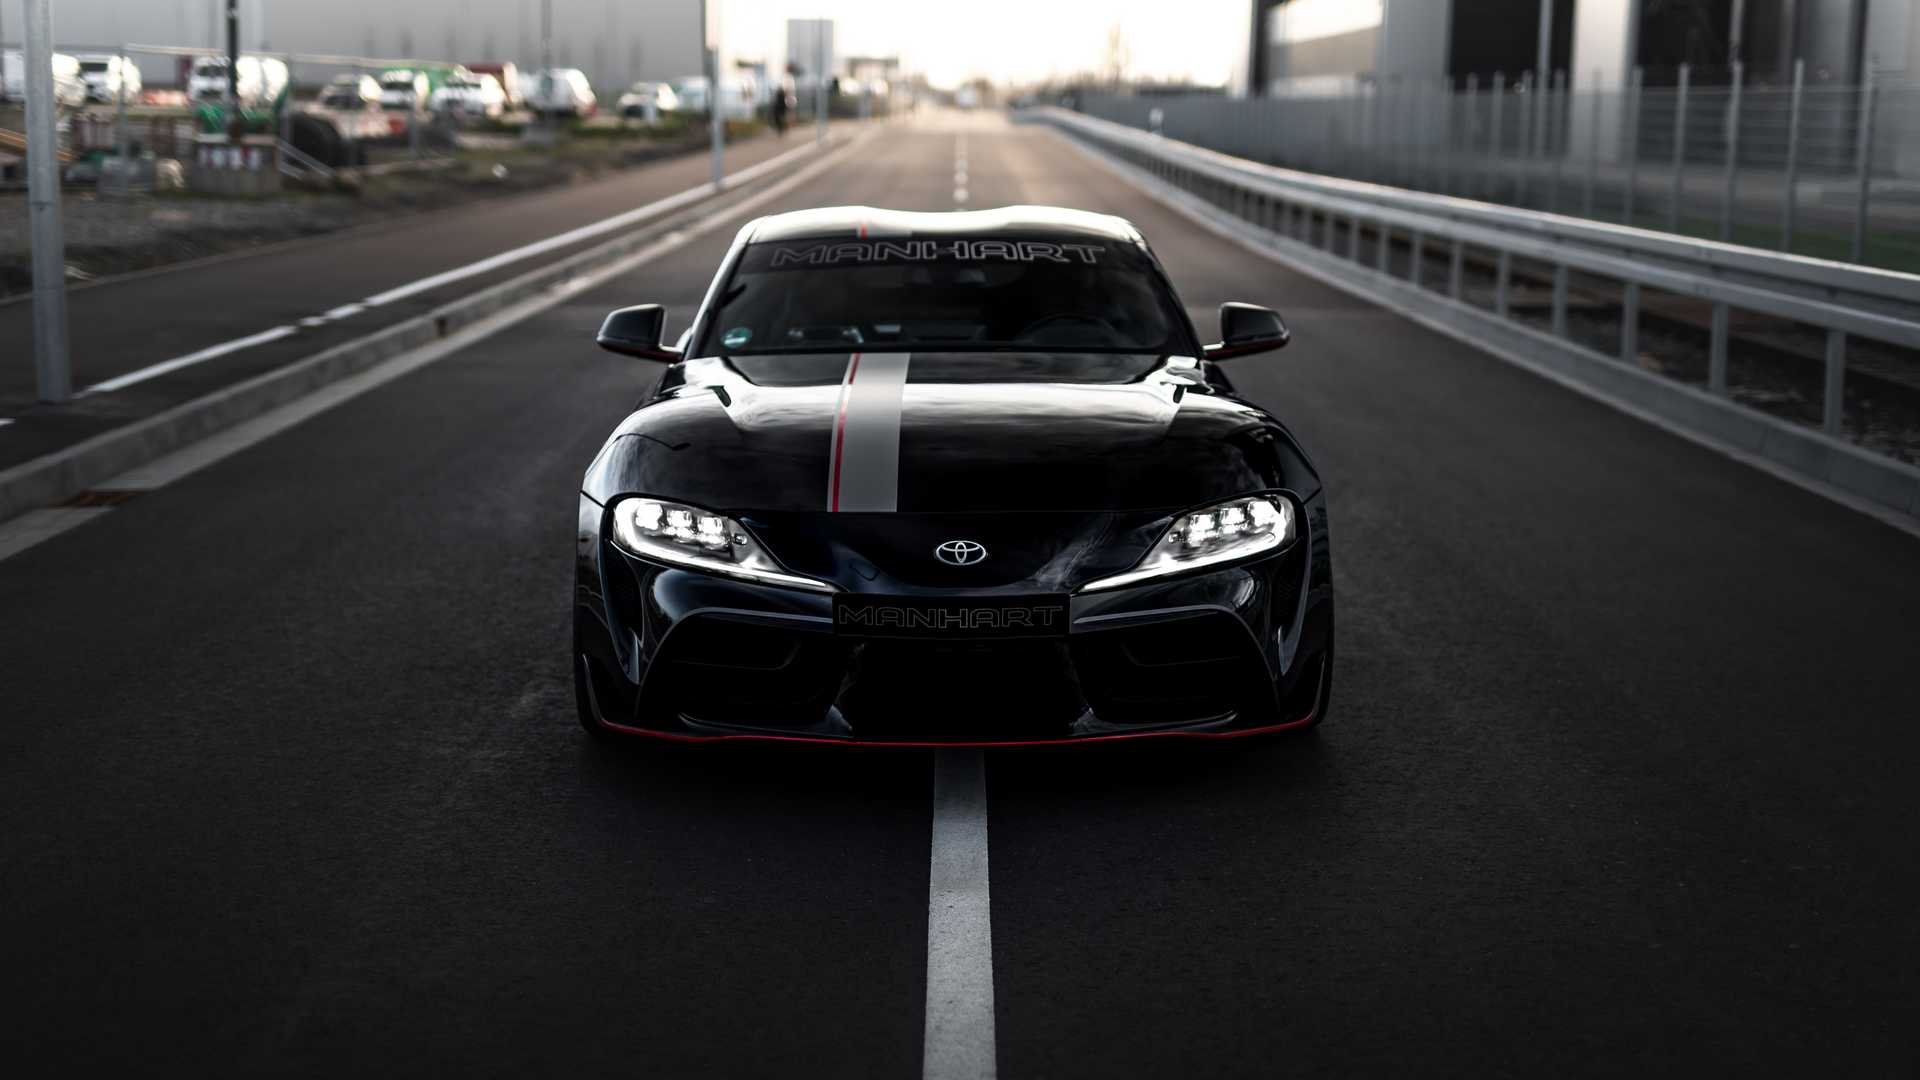 Toyota-Supra-by-manhart-supra-gr-450-15